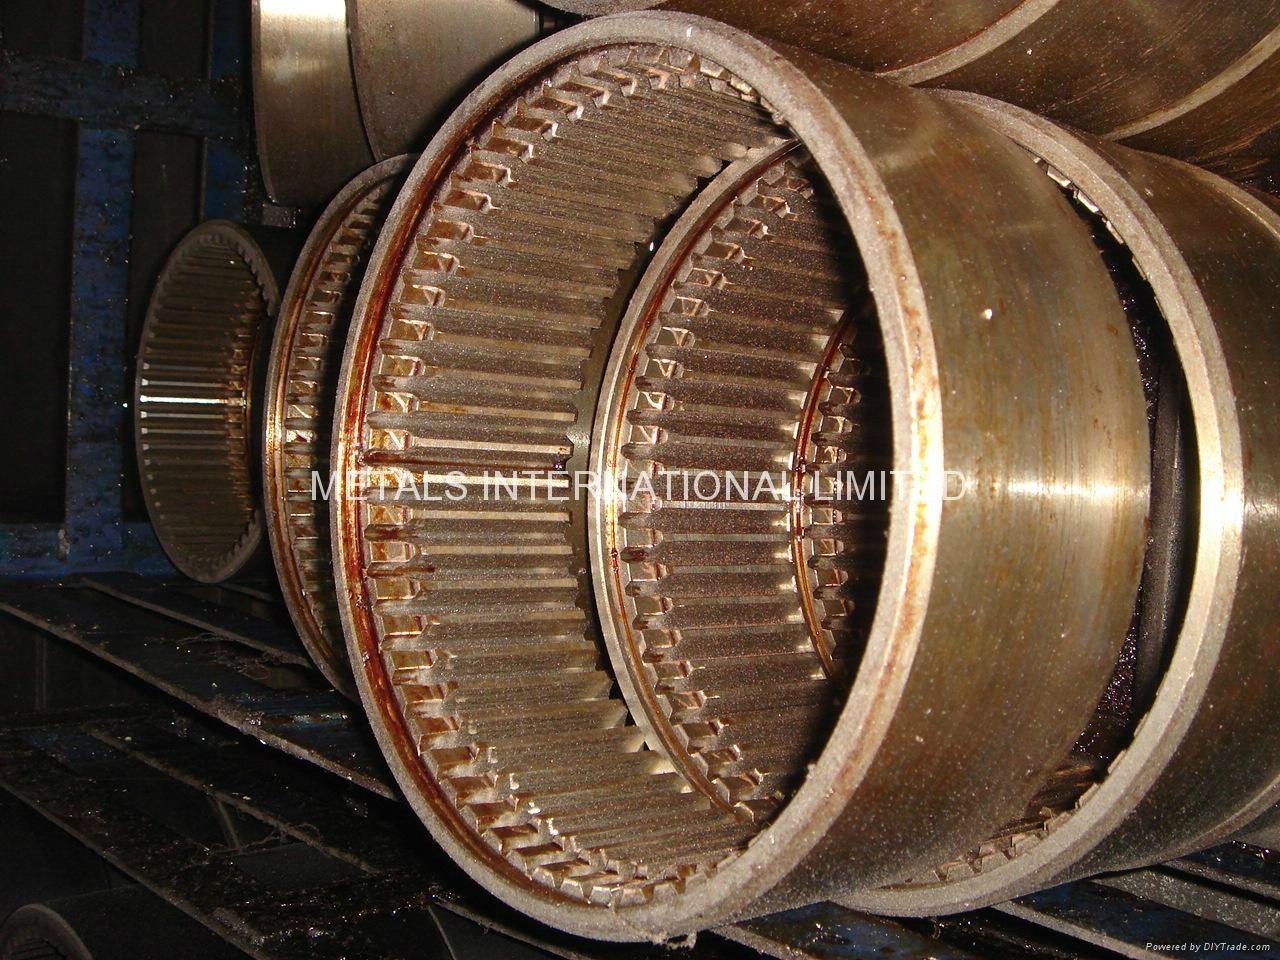 ASTM A105,A181,A182,A266,A288,A289,A290,A291 Forgings,Forging Products 10